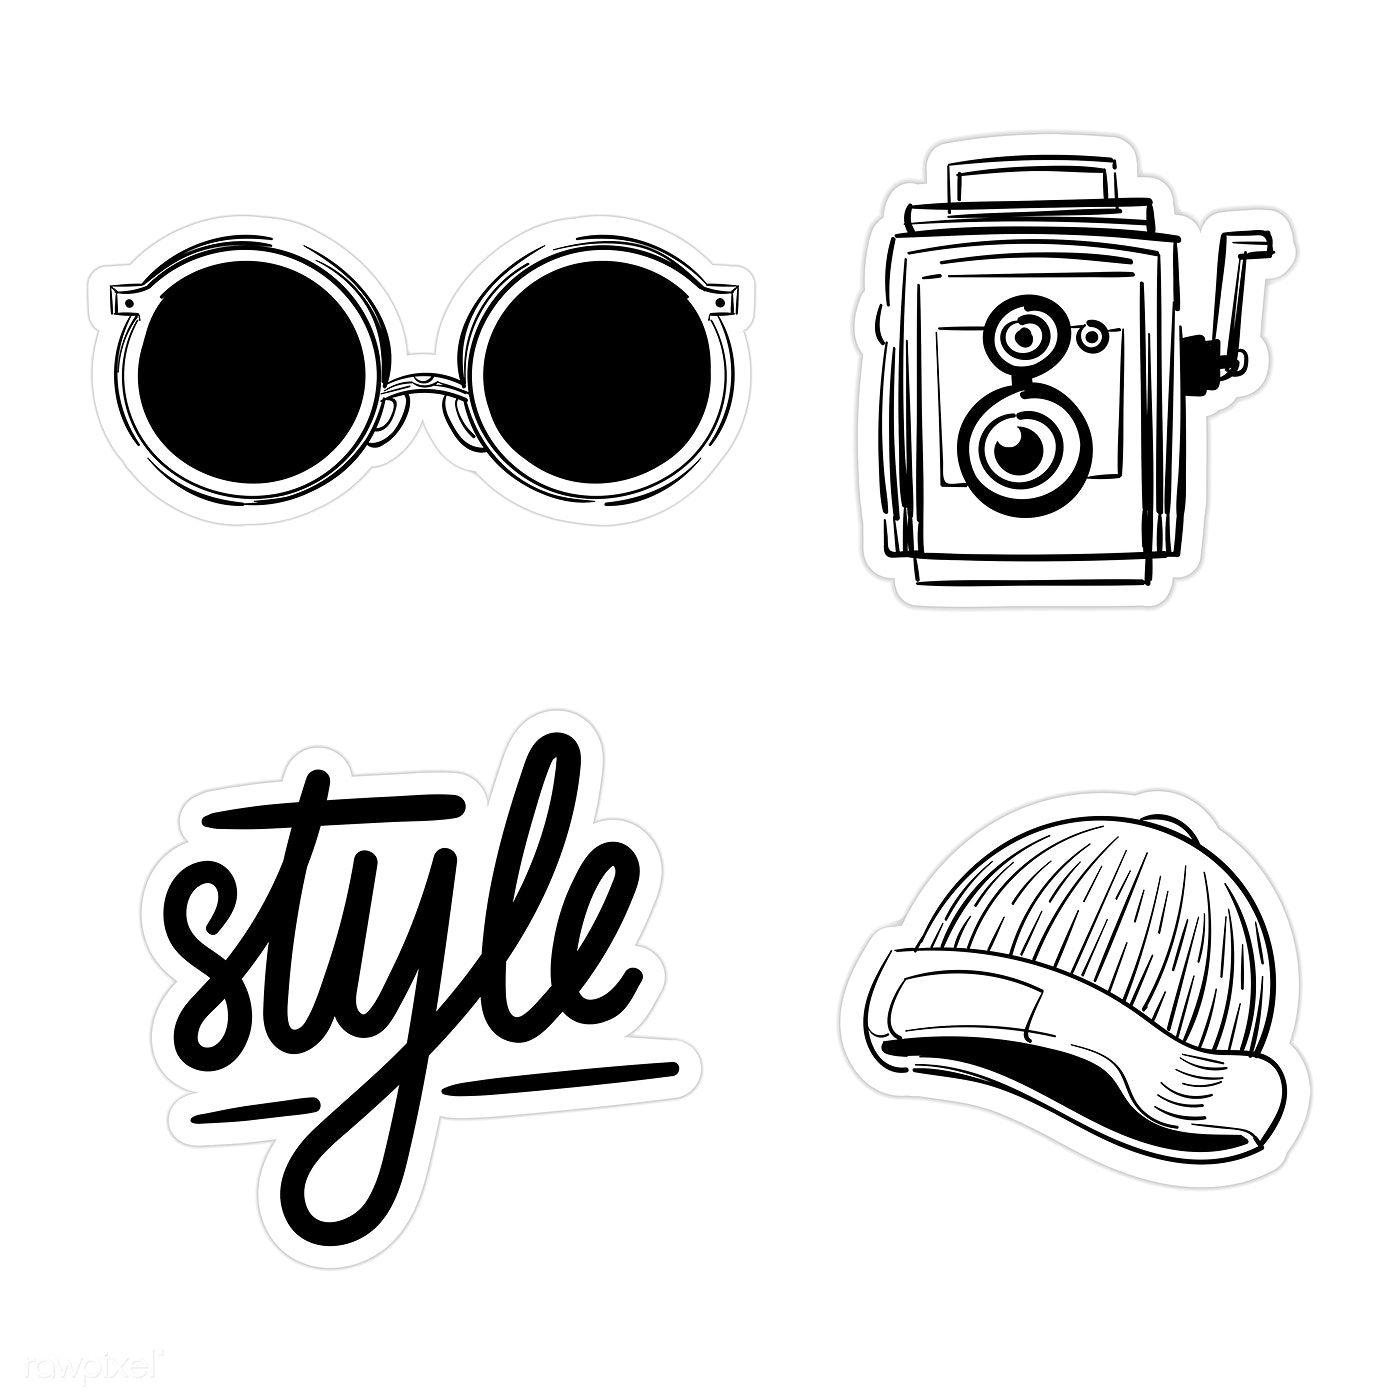 Download premium illustration of Set of black and white